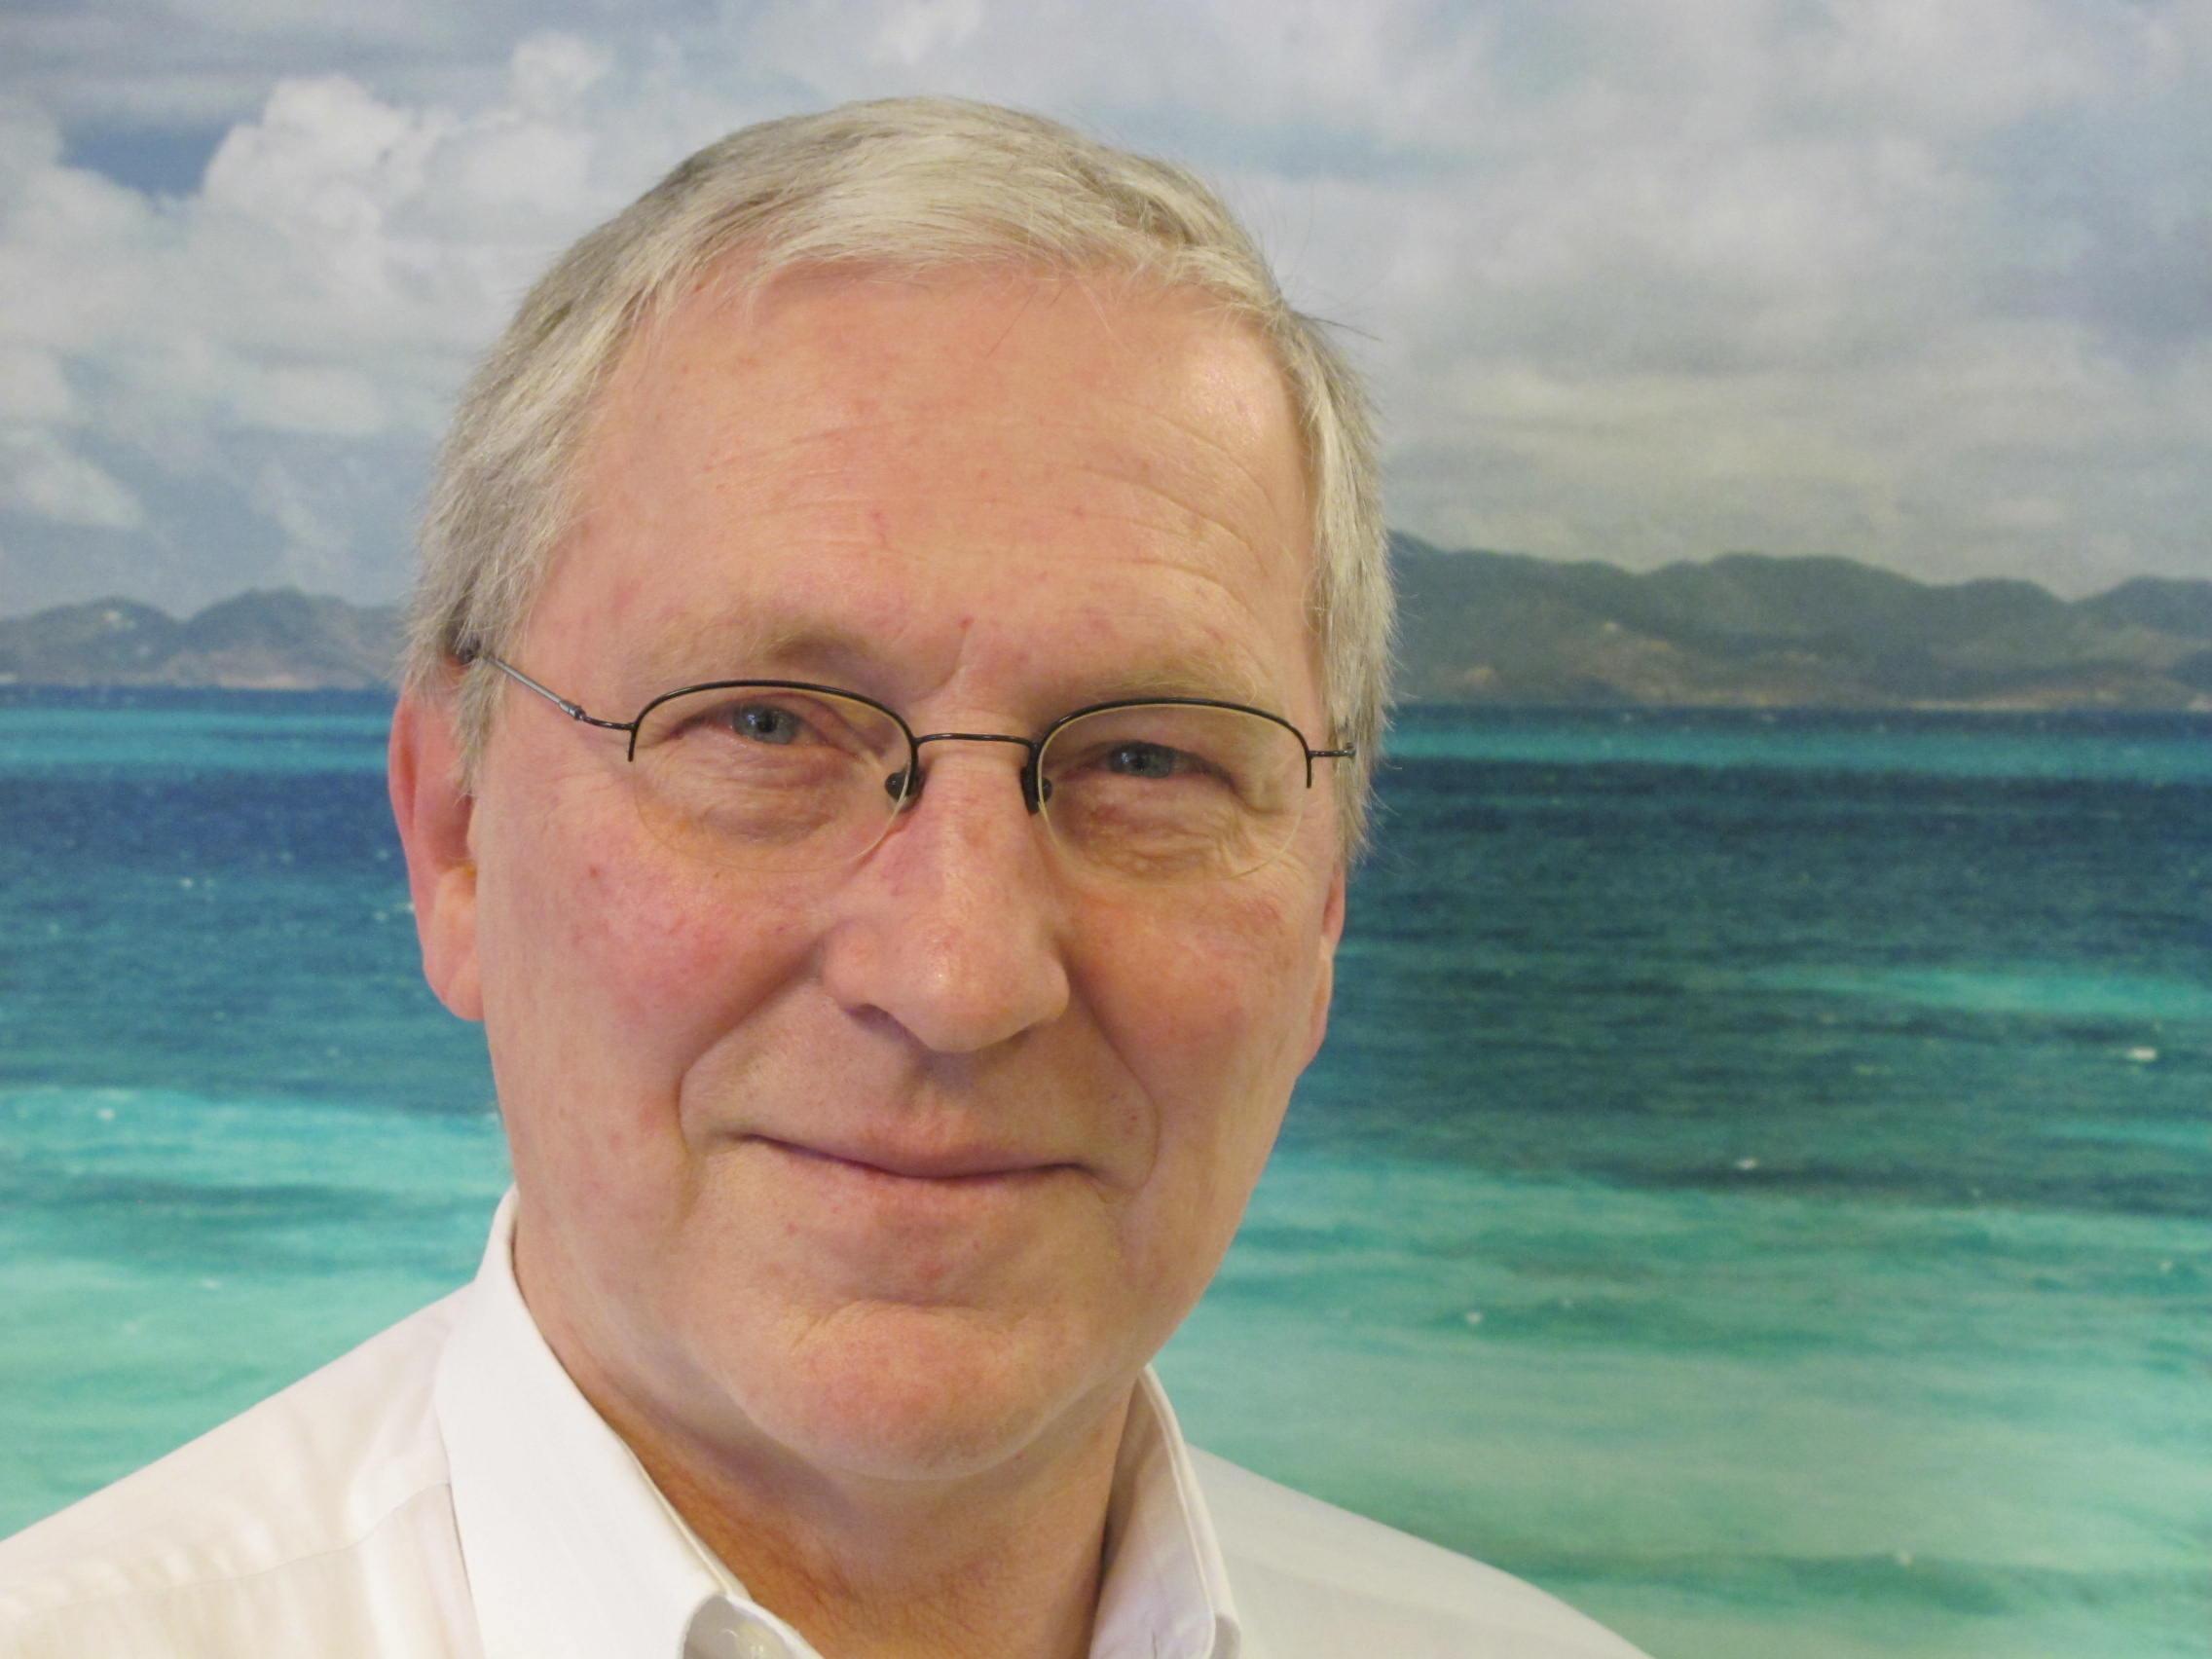 Peter Schneemann